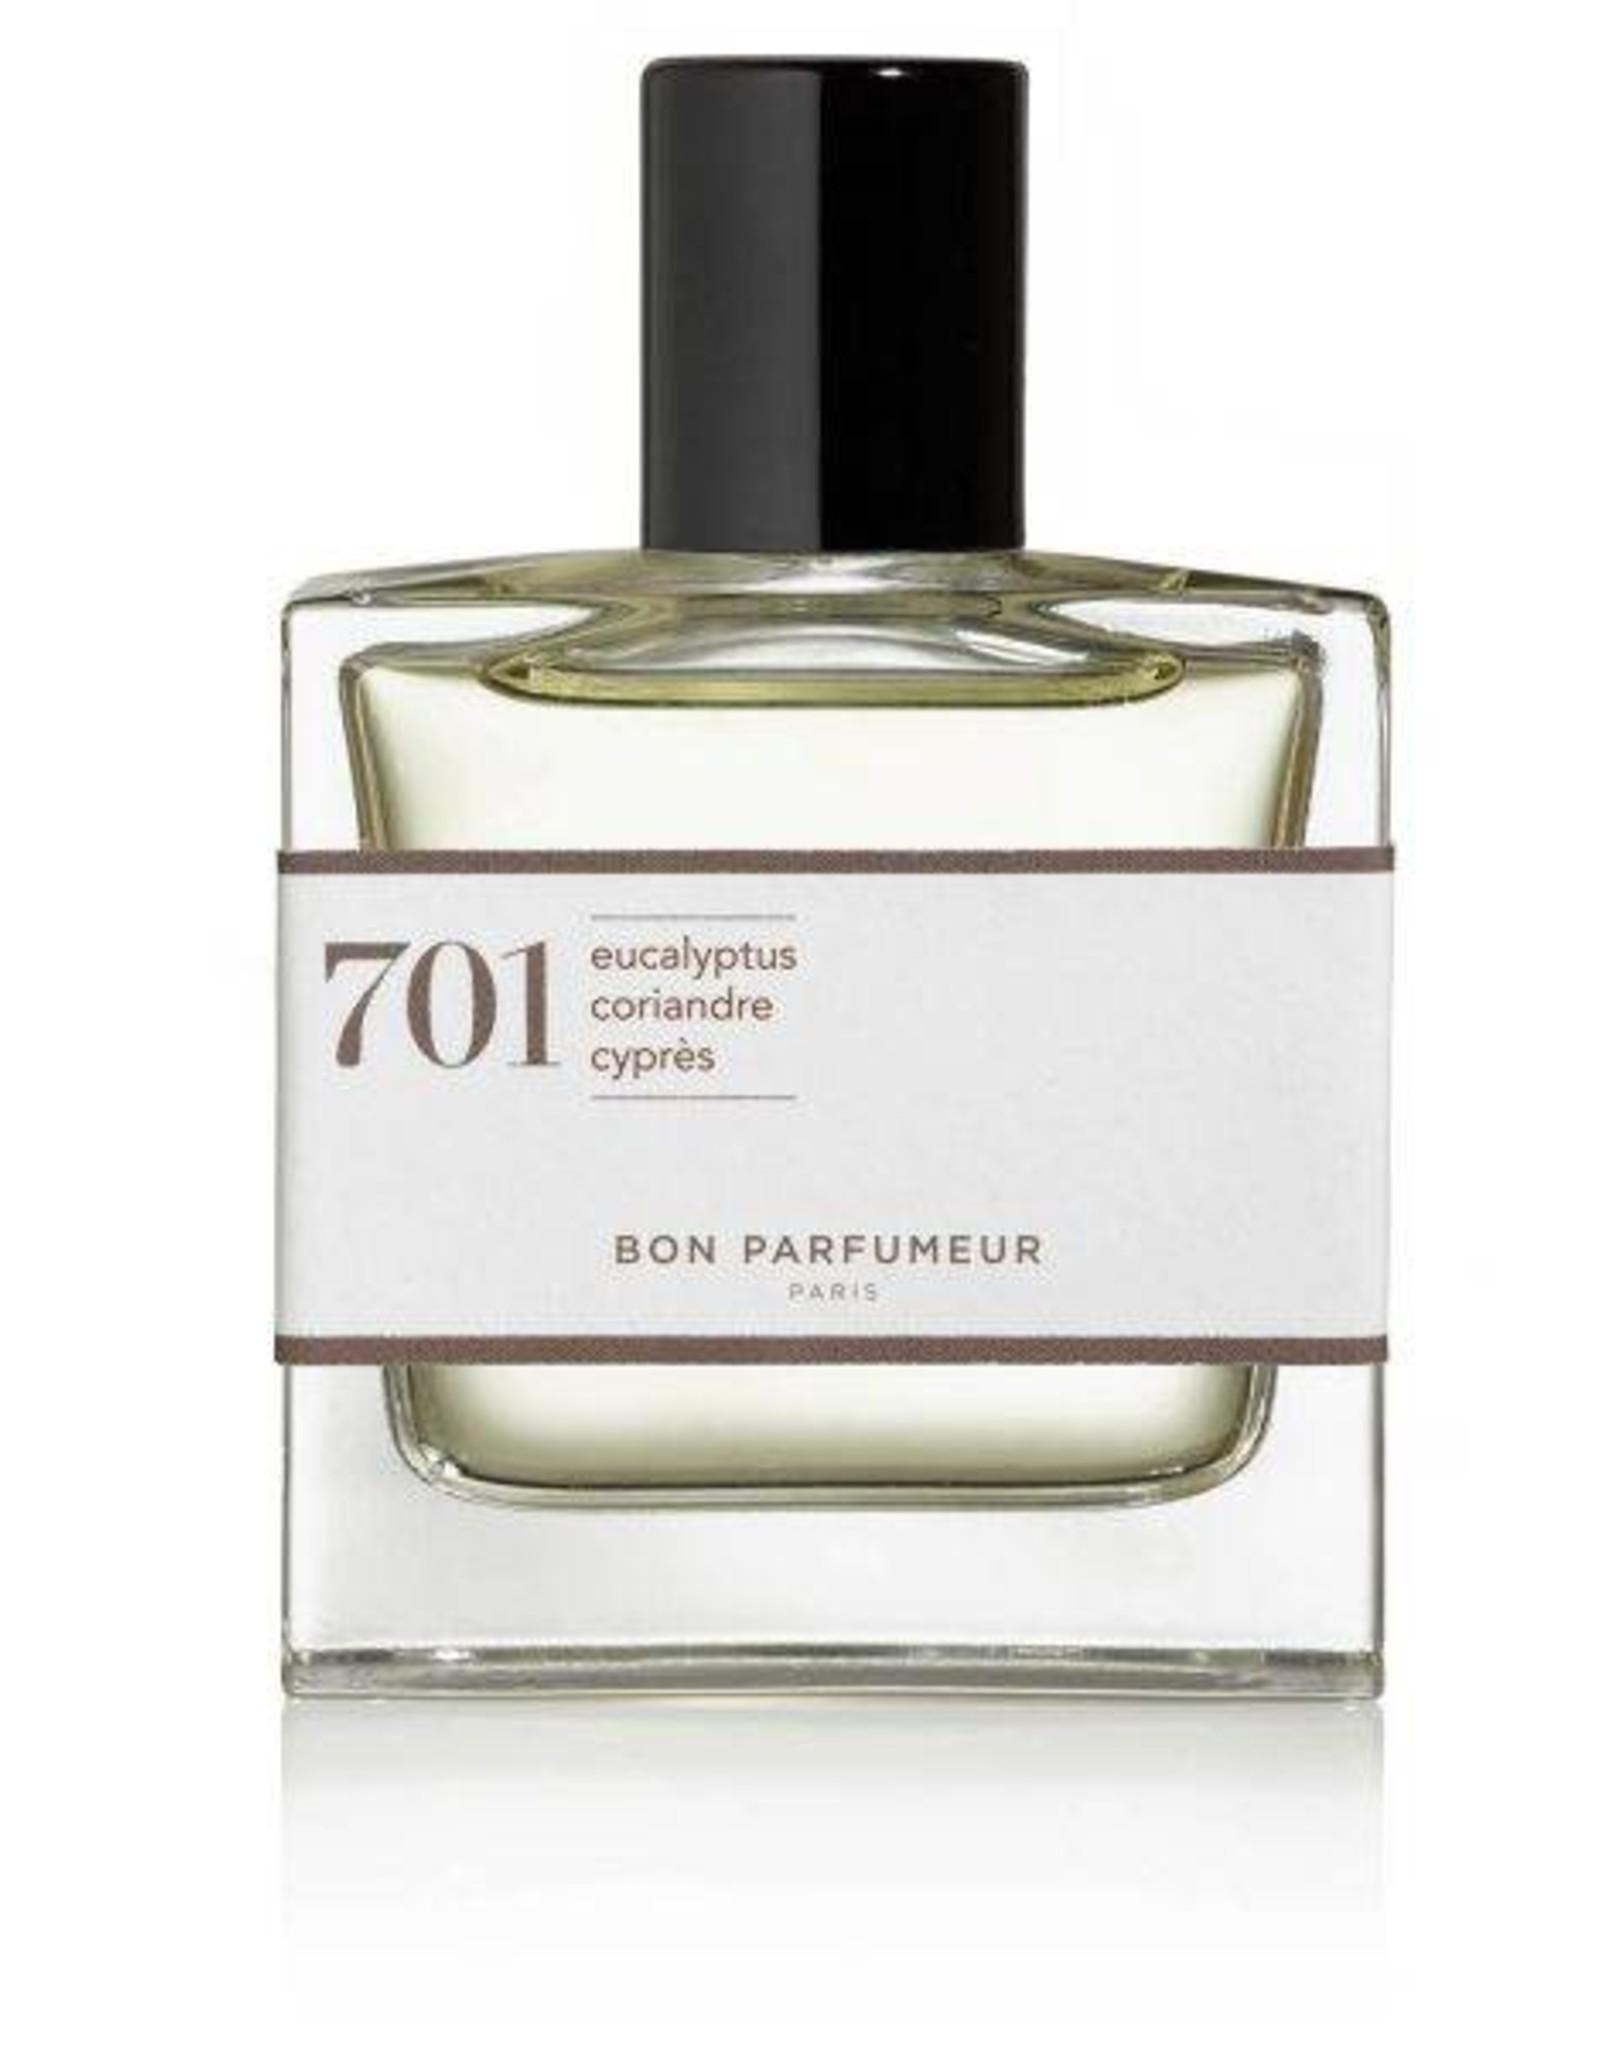 Bon Parfumeur Bon Parfumeur 701 eucalyptus, amber, white wood